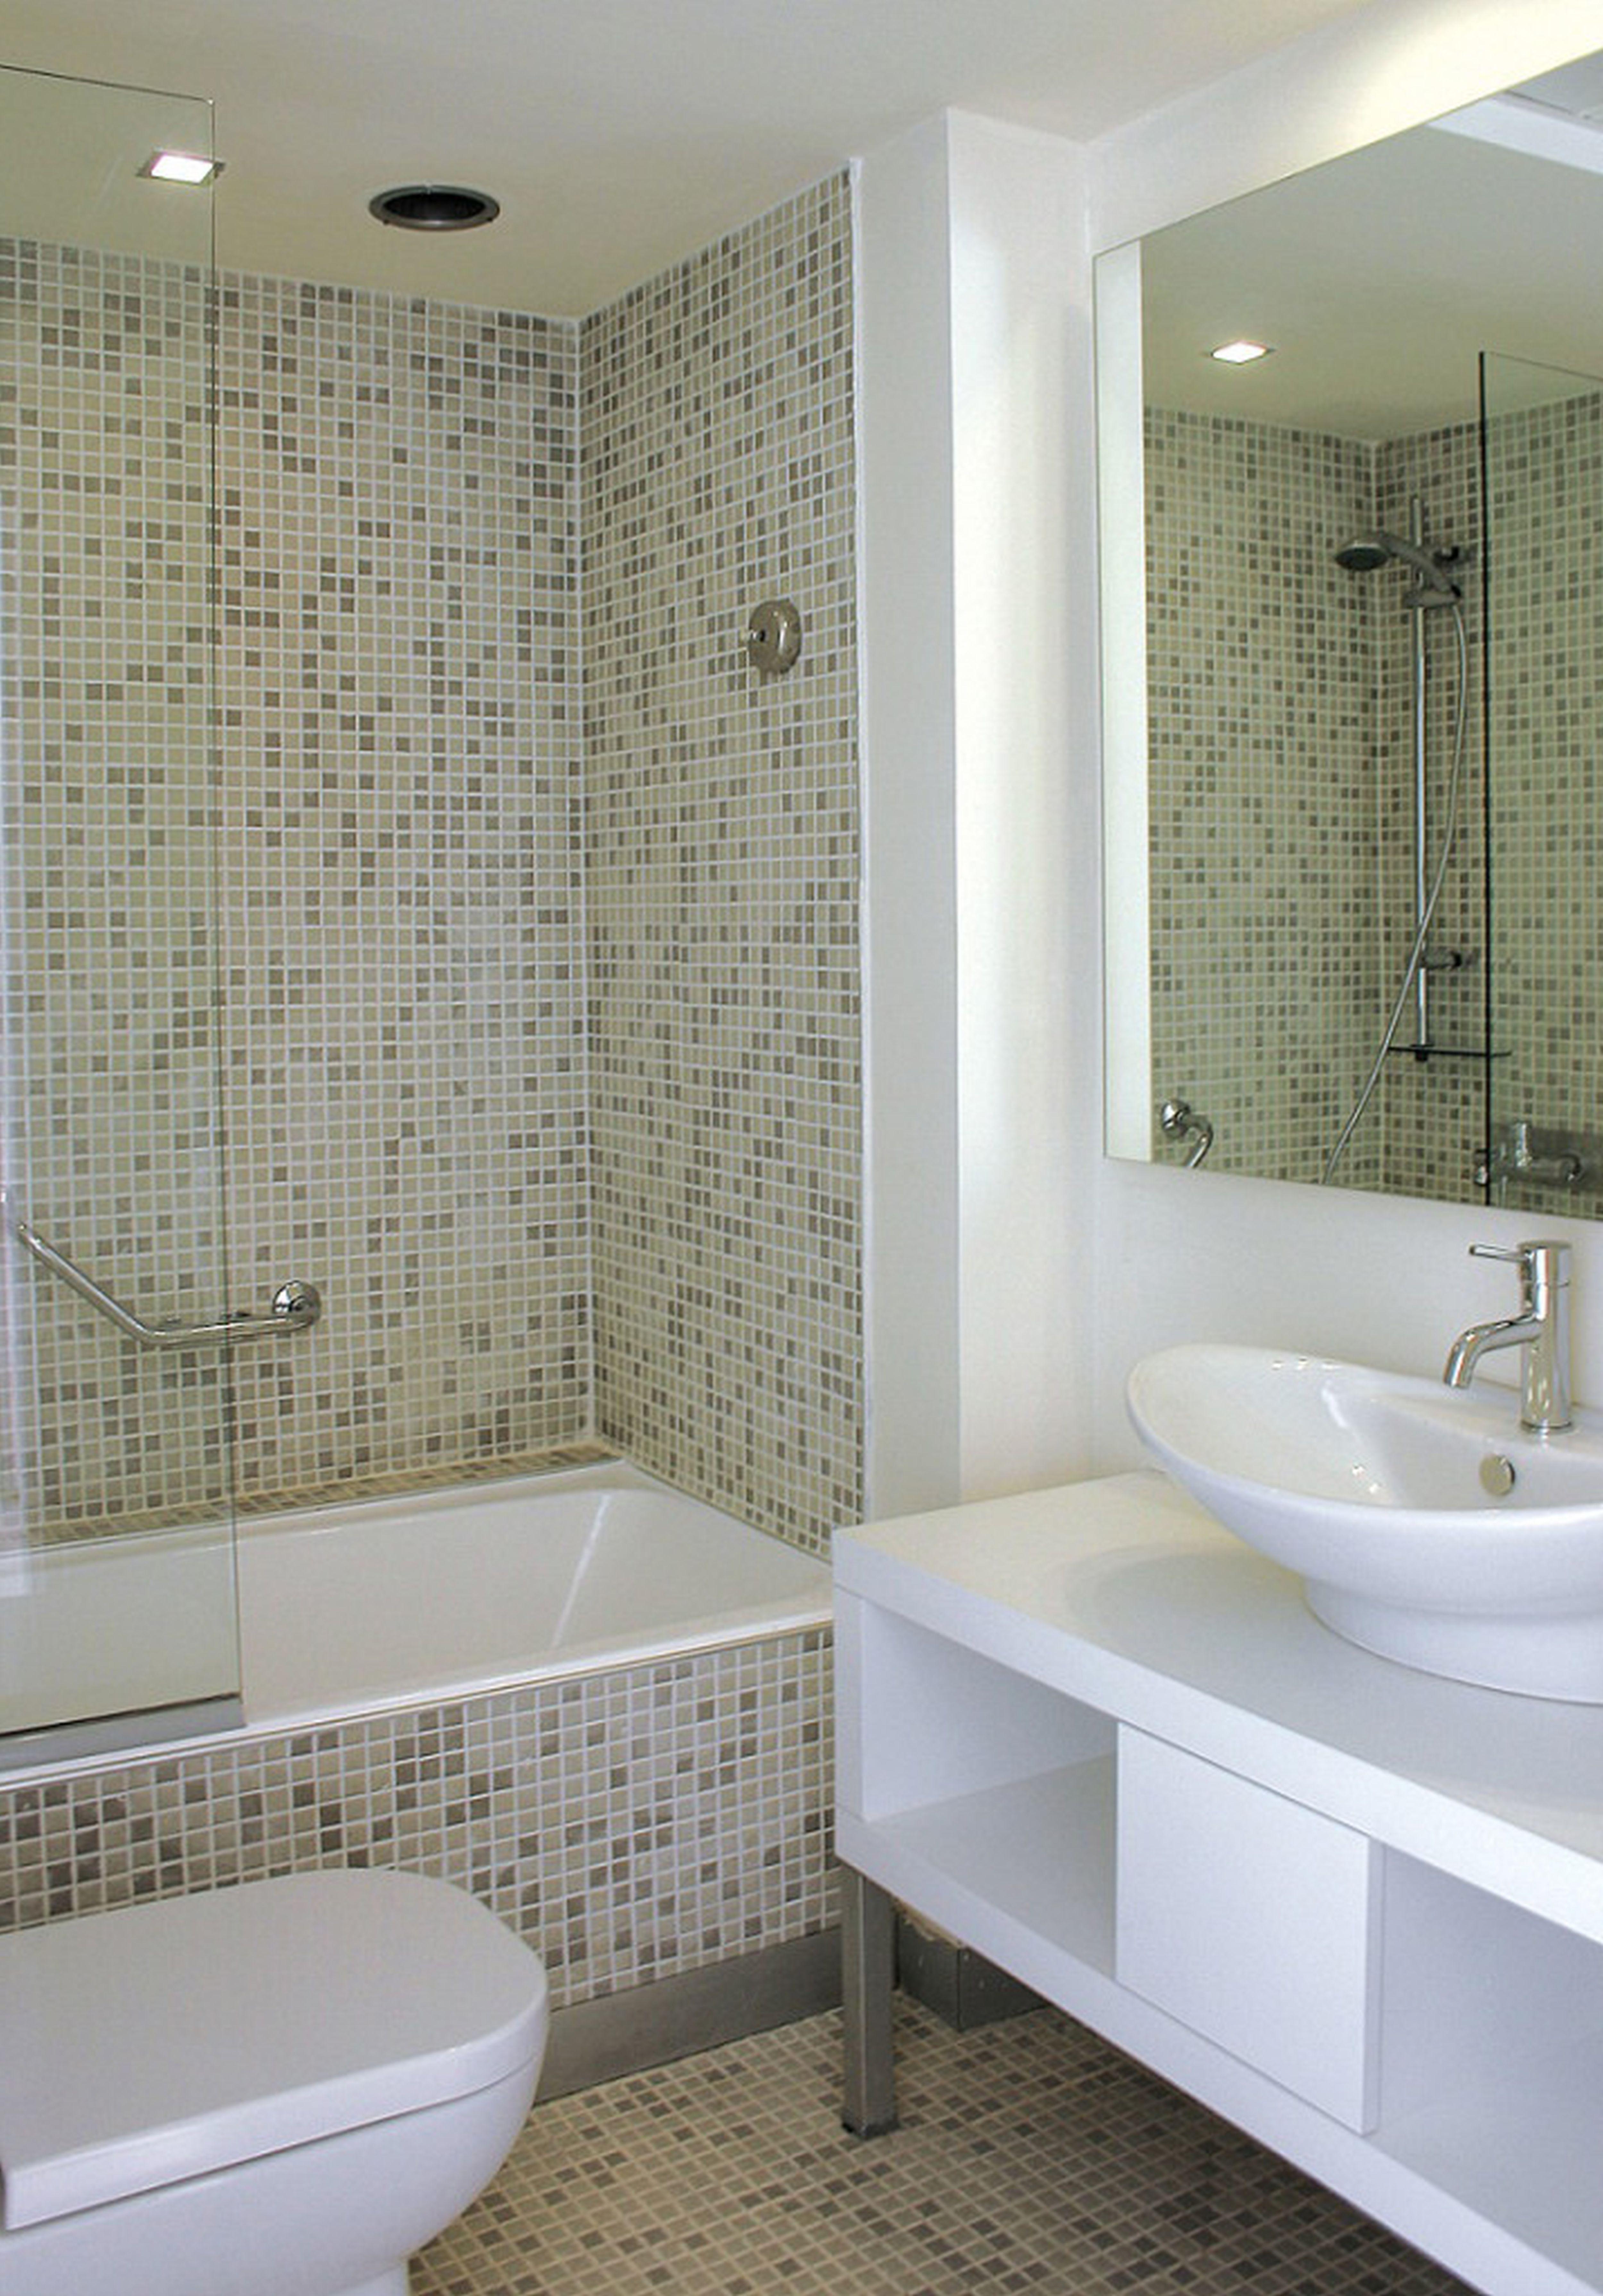 Small Bathroom Space Ideas - HomesFeed on Small Space Small Bathroom Ideas Small Space Toilet Design id=69732